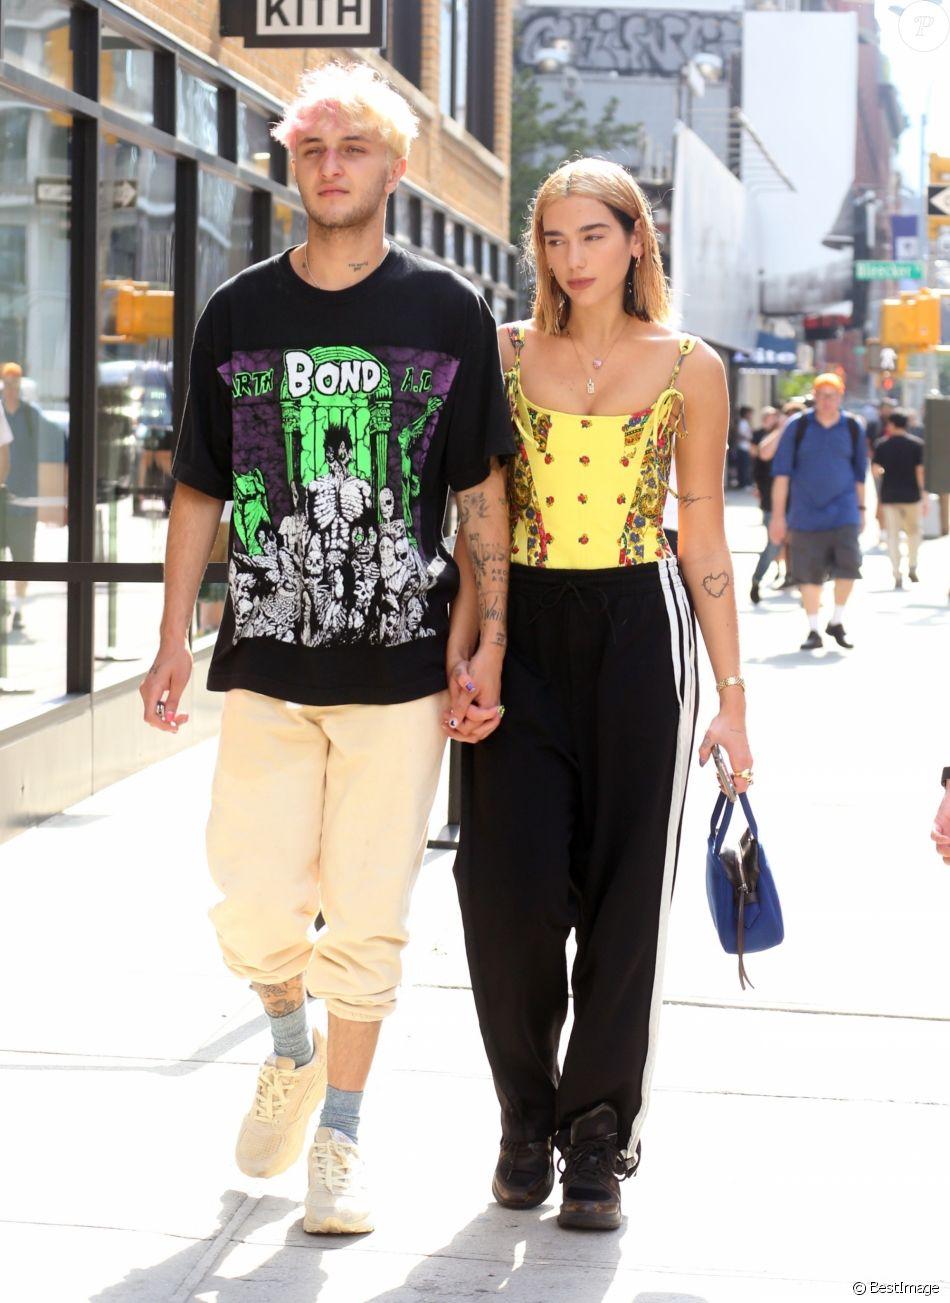 Dua Lipa et son petit ami Anwar Hadid sont allés déjeuner en amoureux à New York, le 2 octobre 2019.